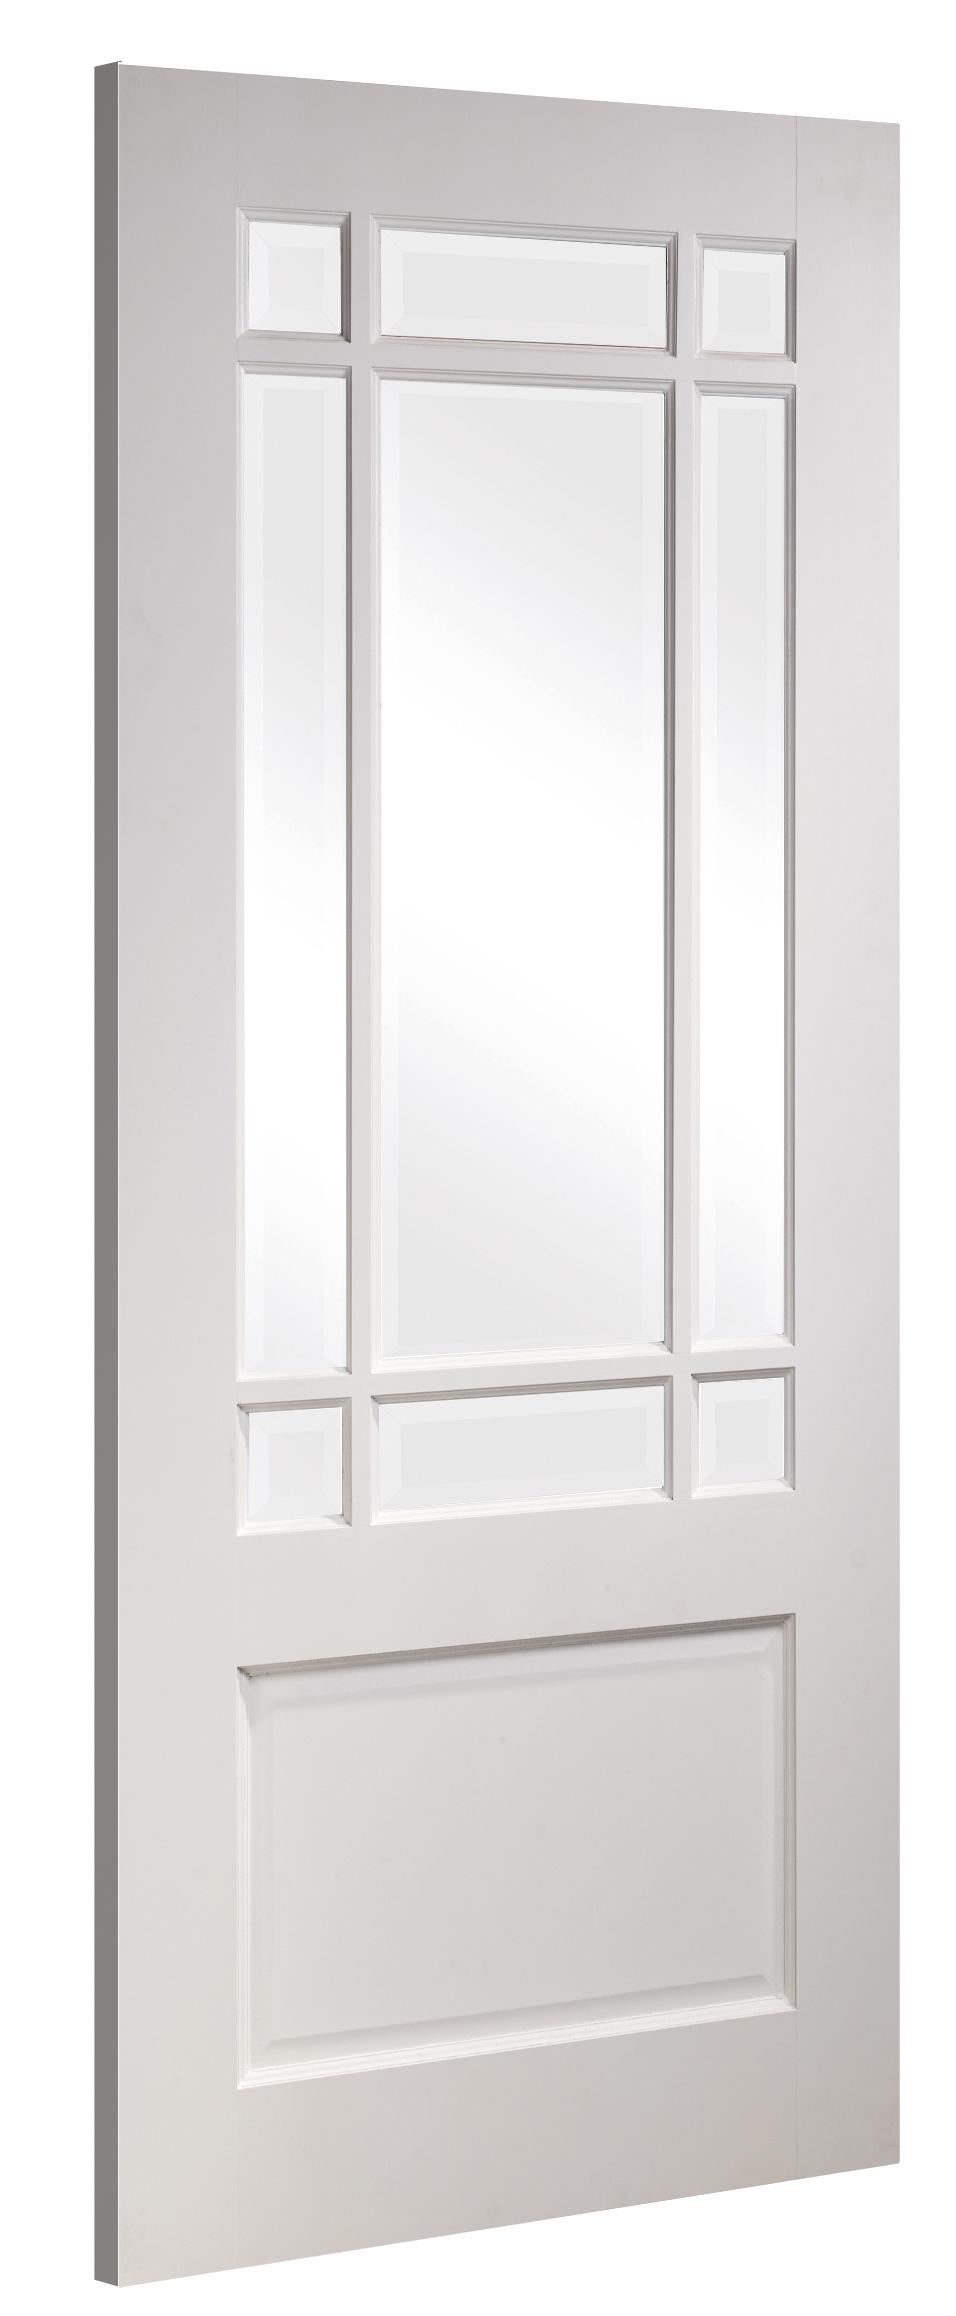 Primed Doors NM9G-B